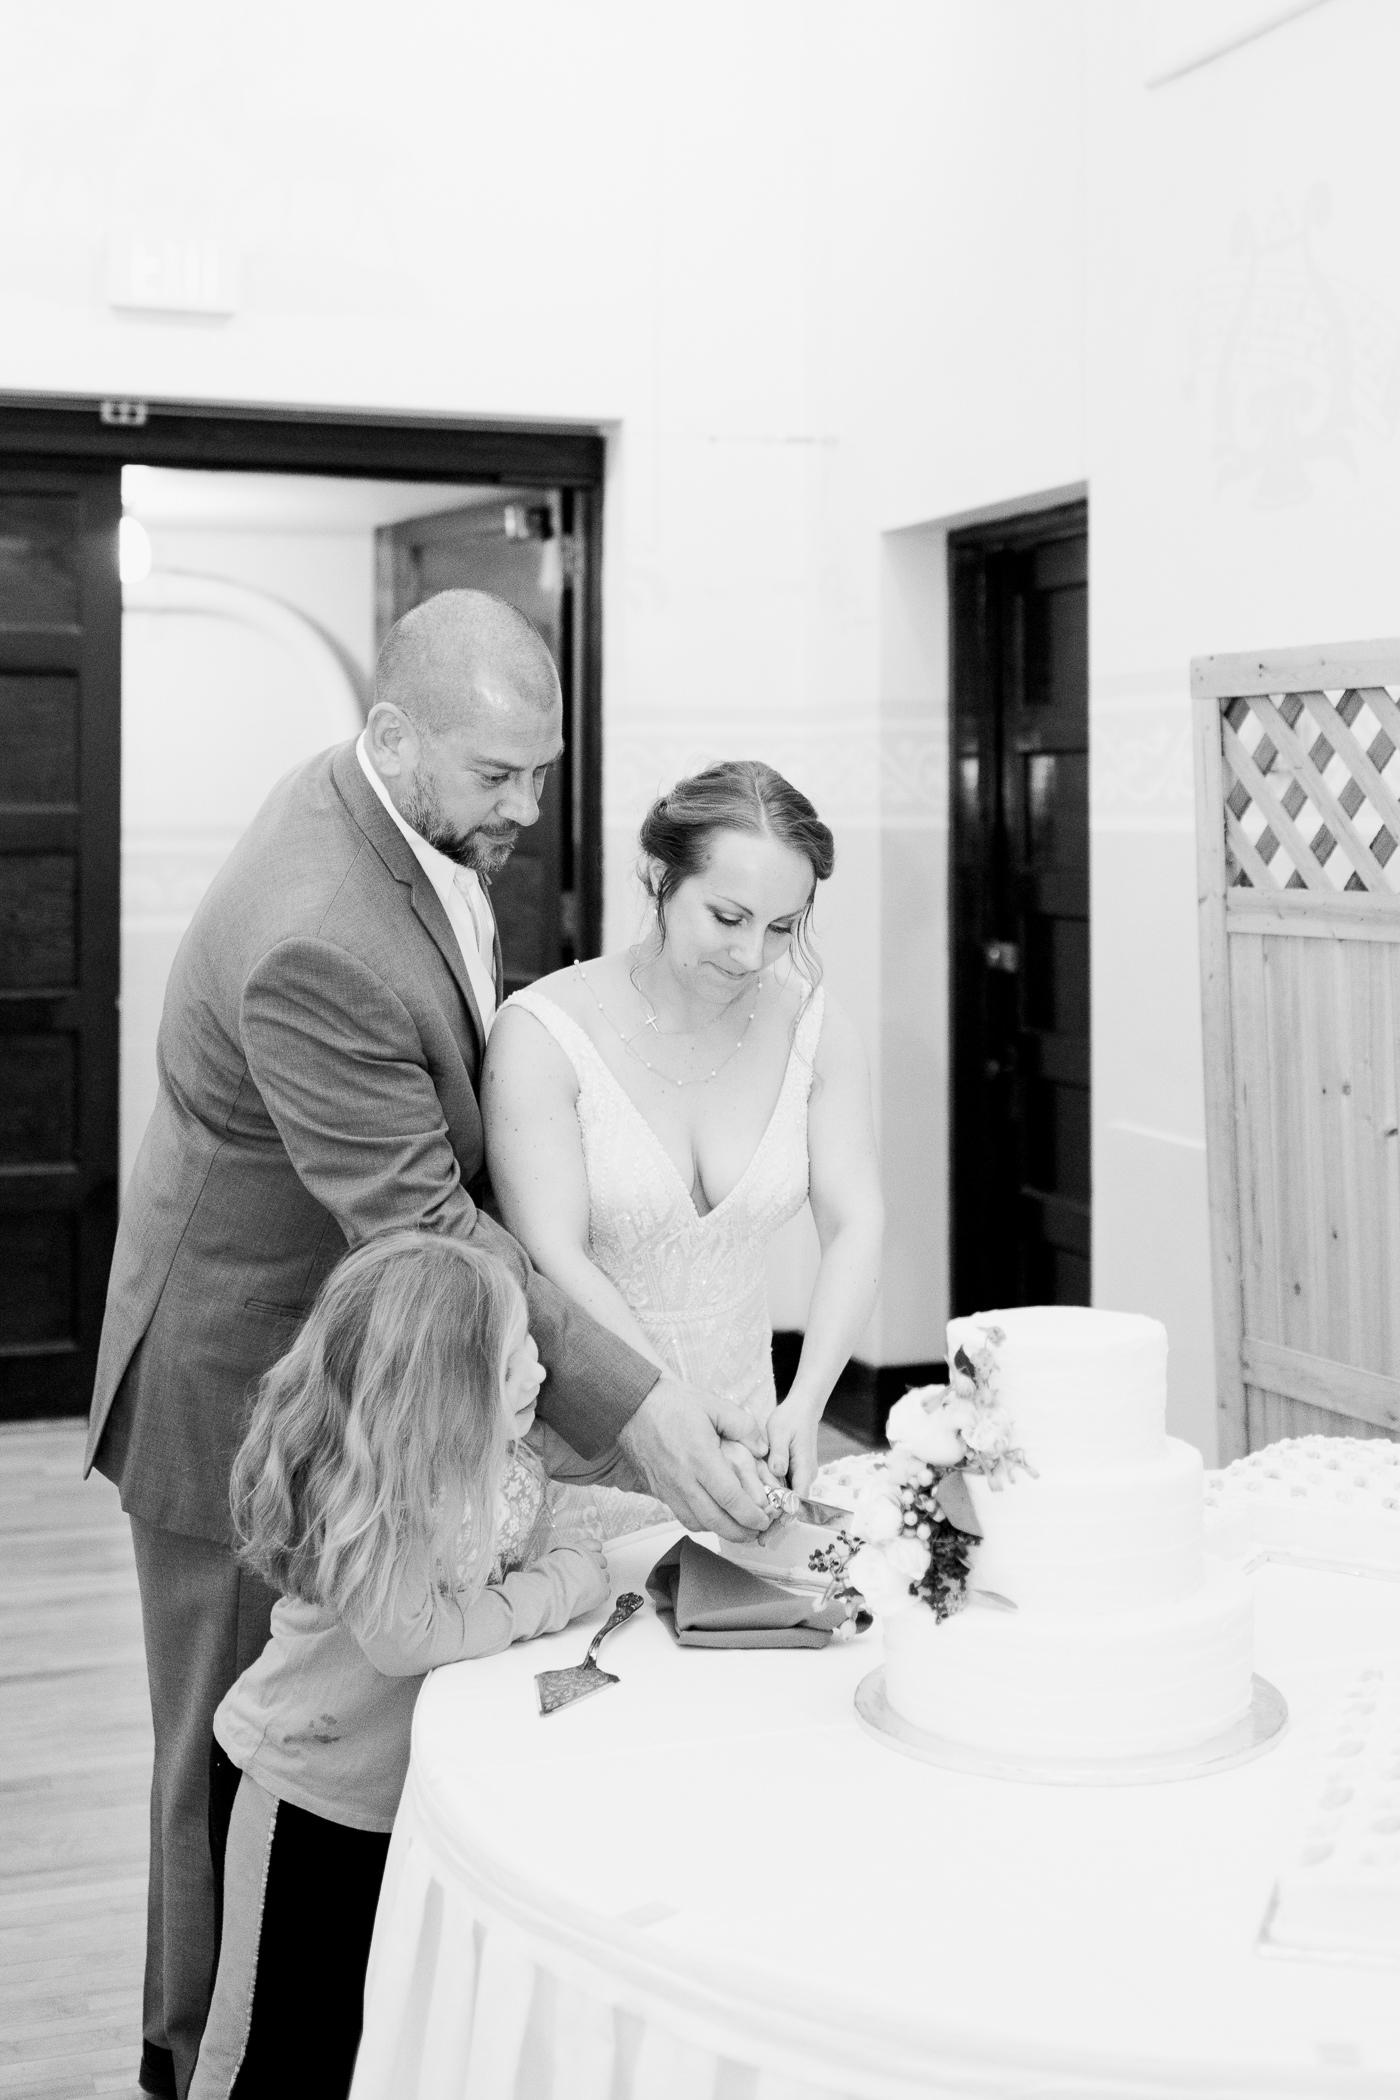 Turner Hall of Monroe, WI Wedding Photographers